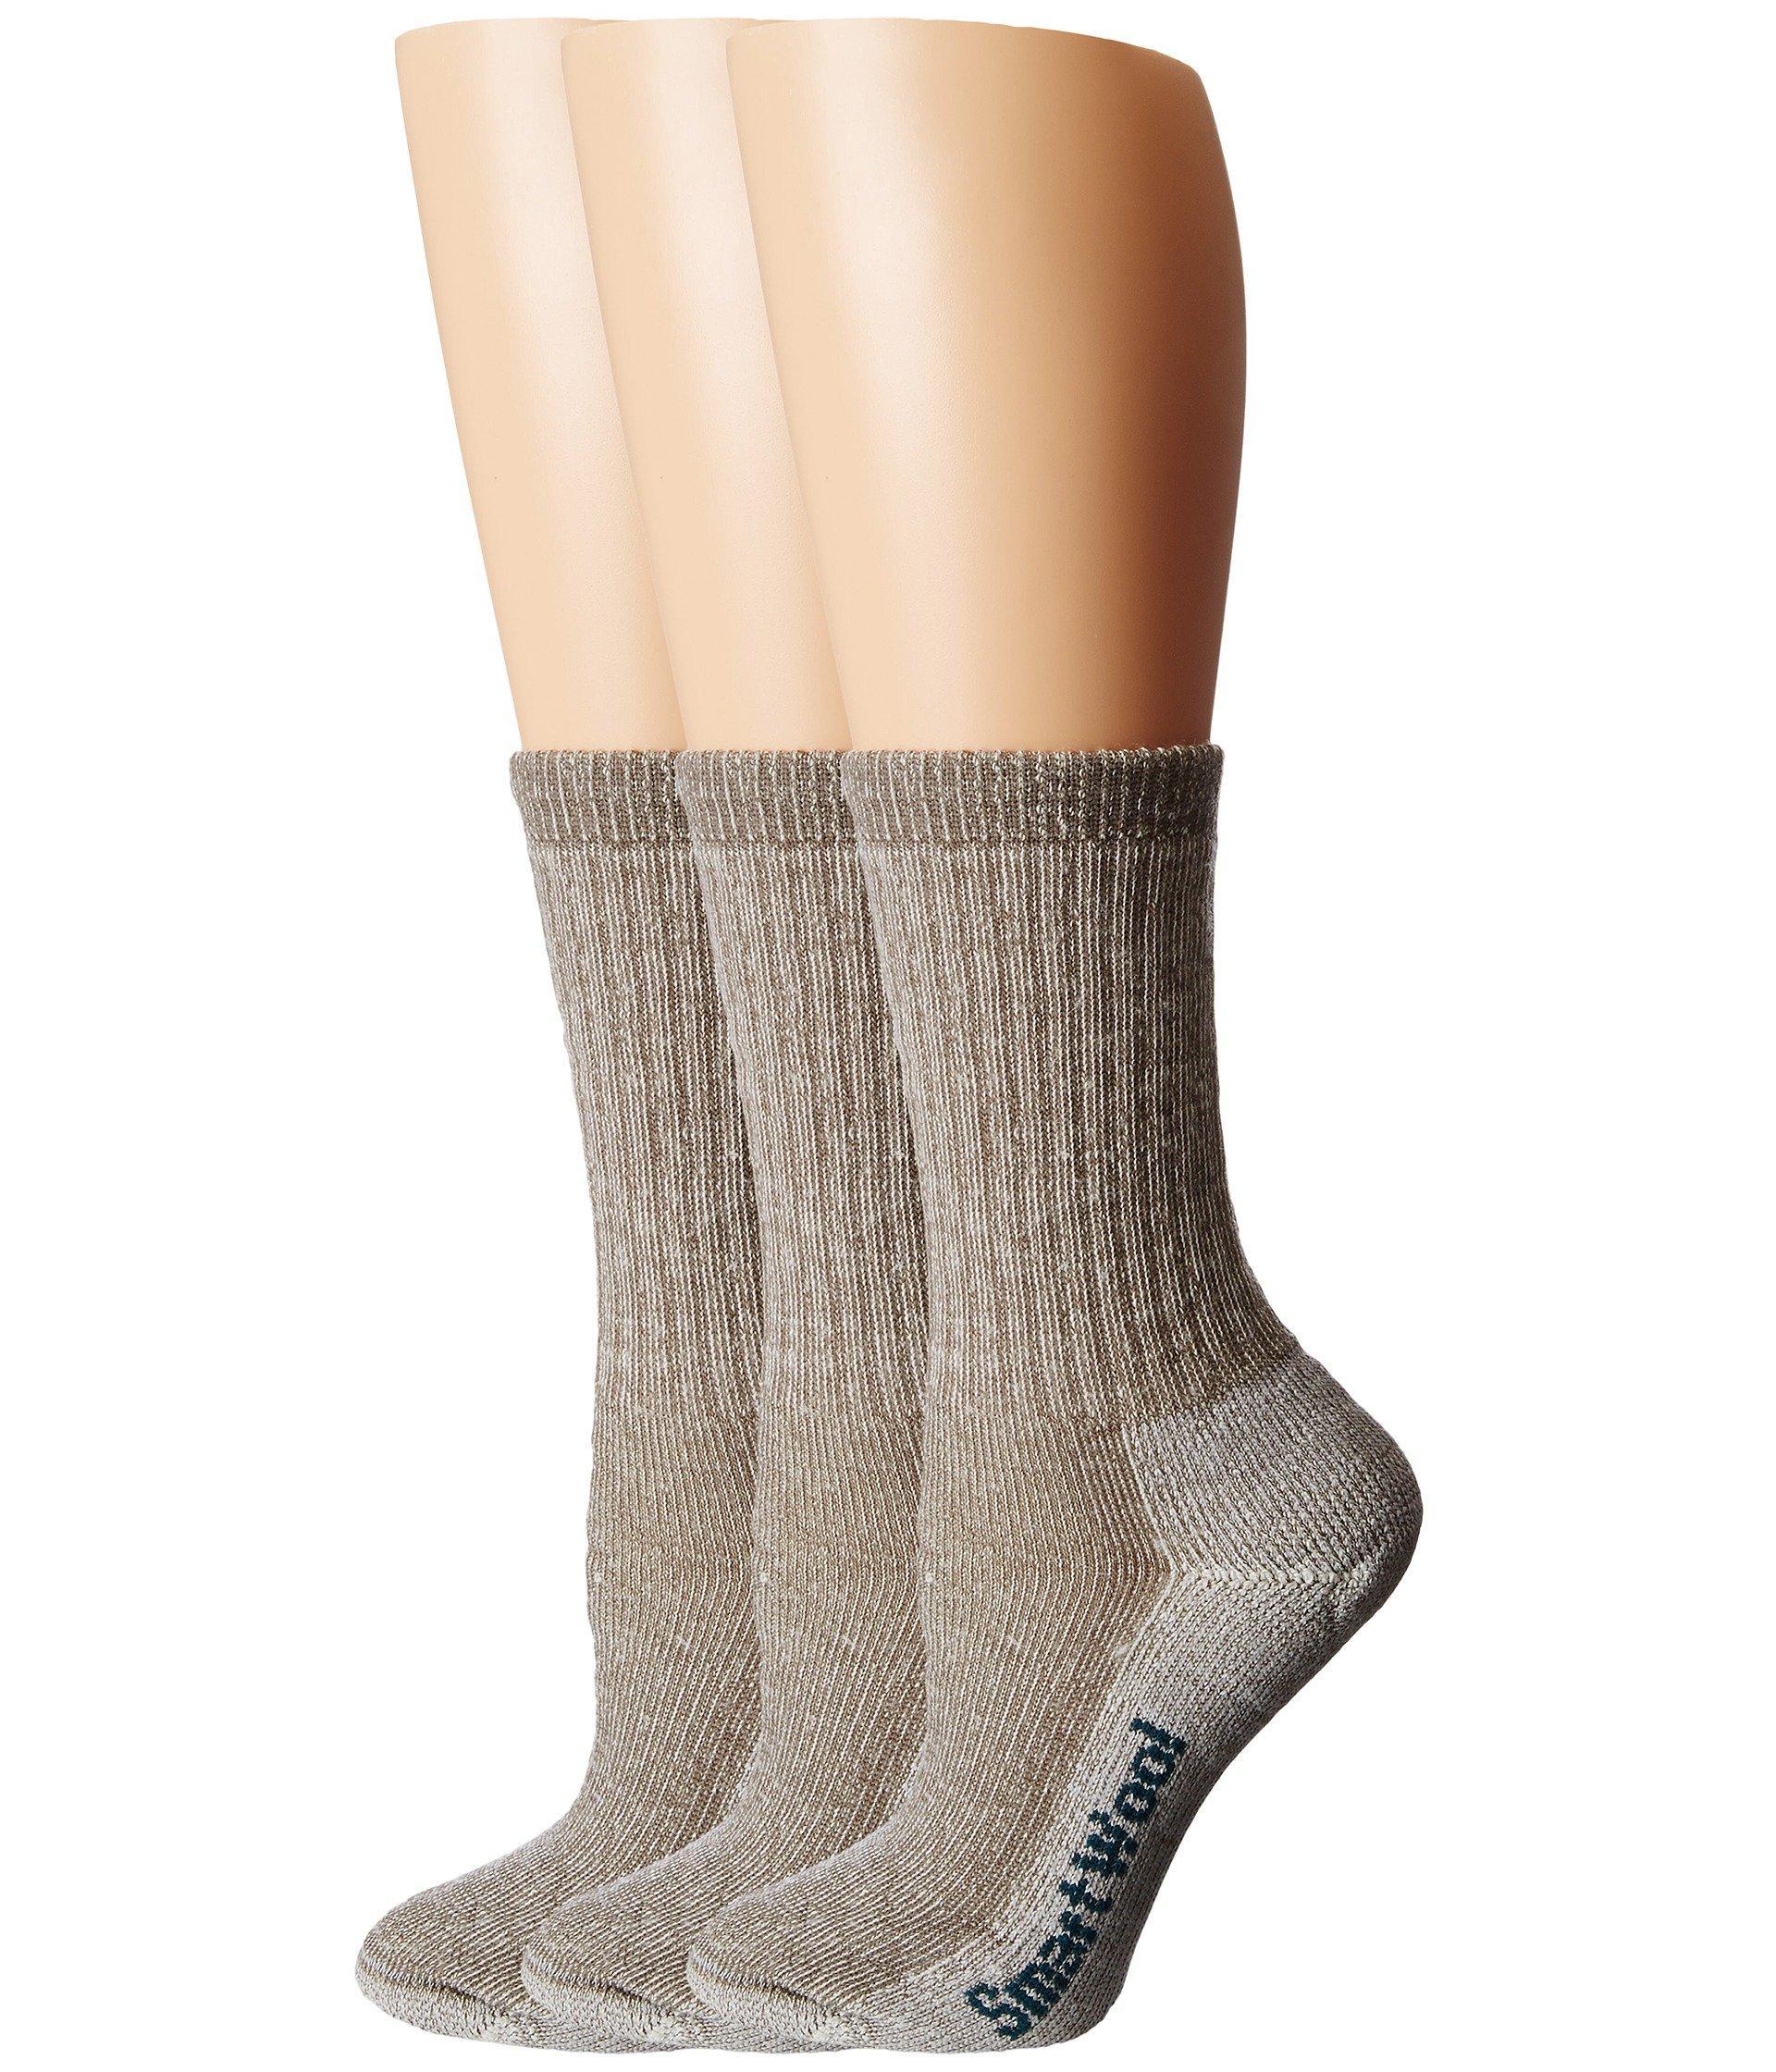 875a481d0e7e5 Smartwool. Brown Hike Medium Crew 3-pack (navy 1) Women's Crew Cut Socks  Shoes